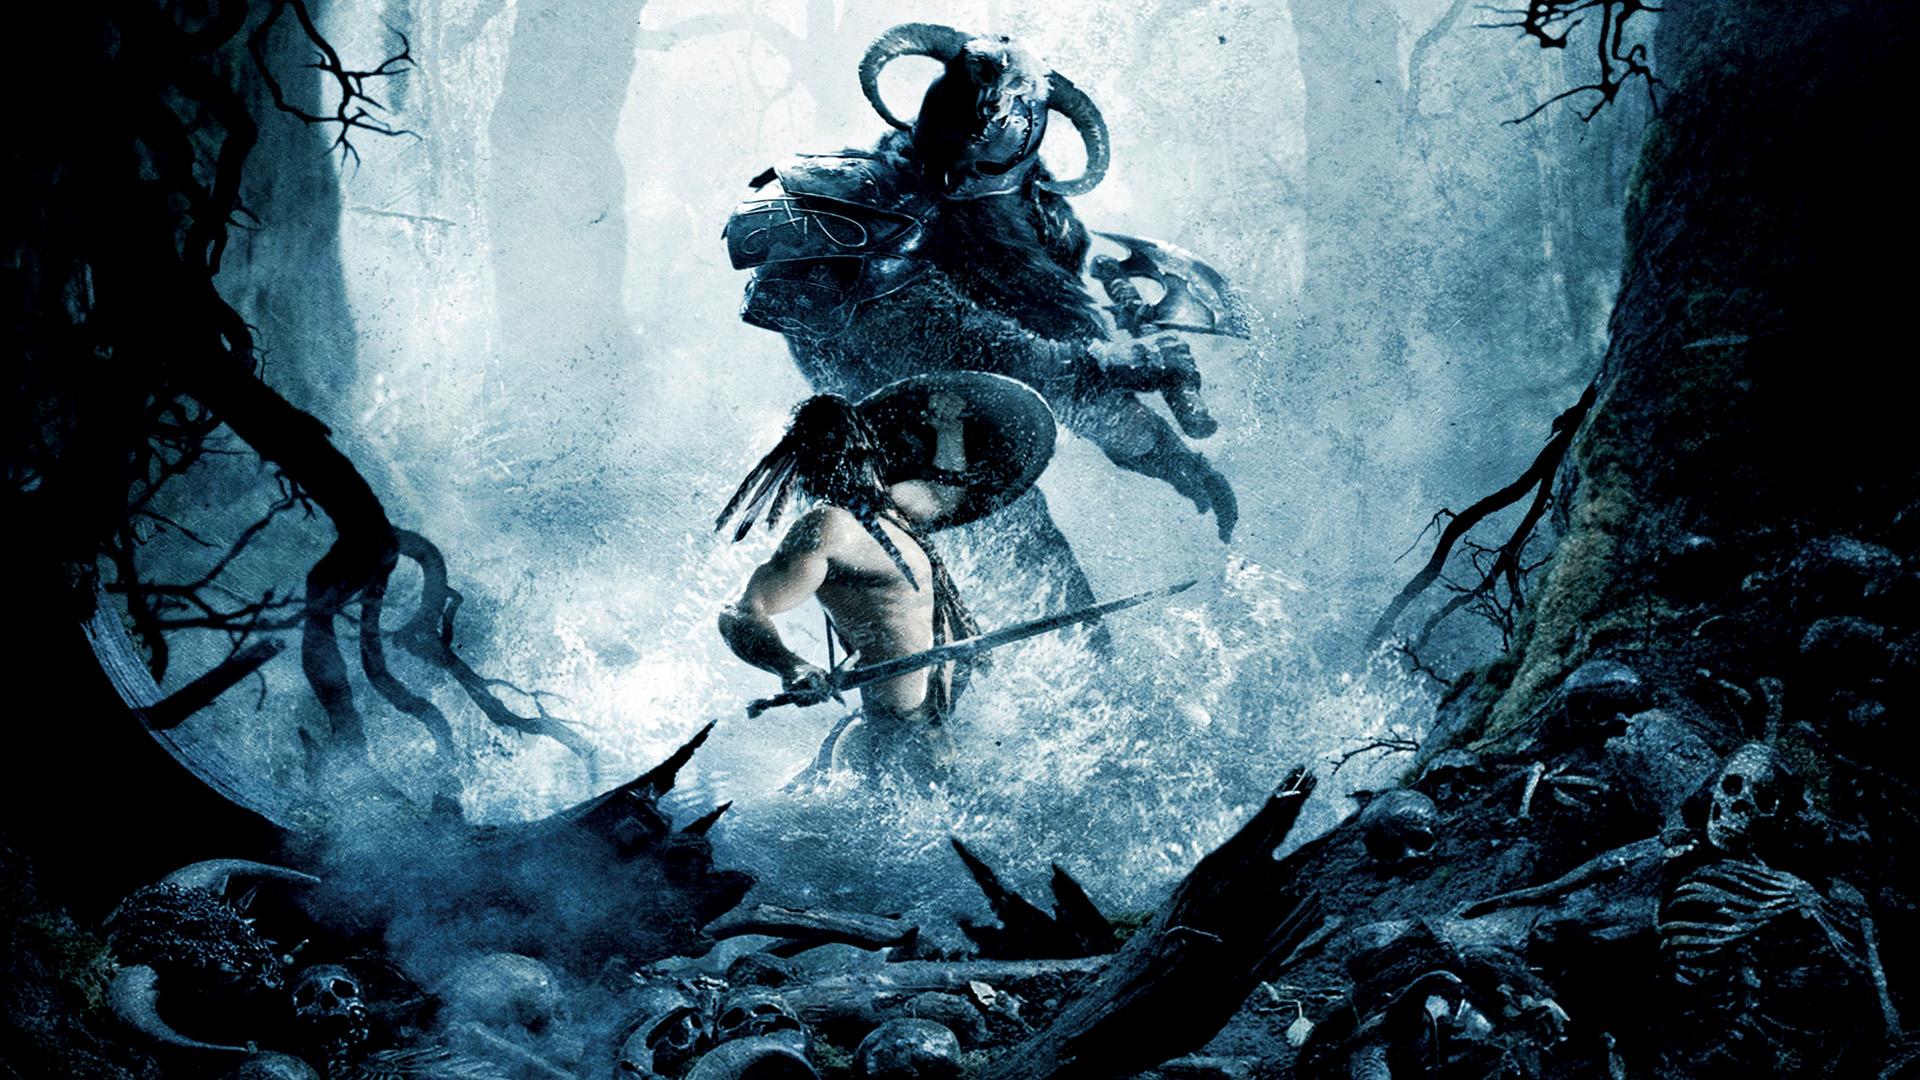 Pathfinder | Movie fanart | fanart.tv